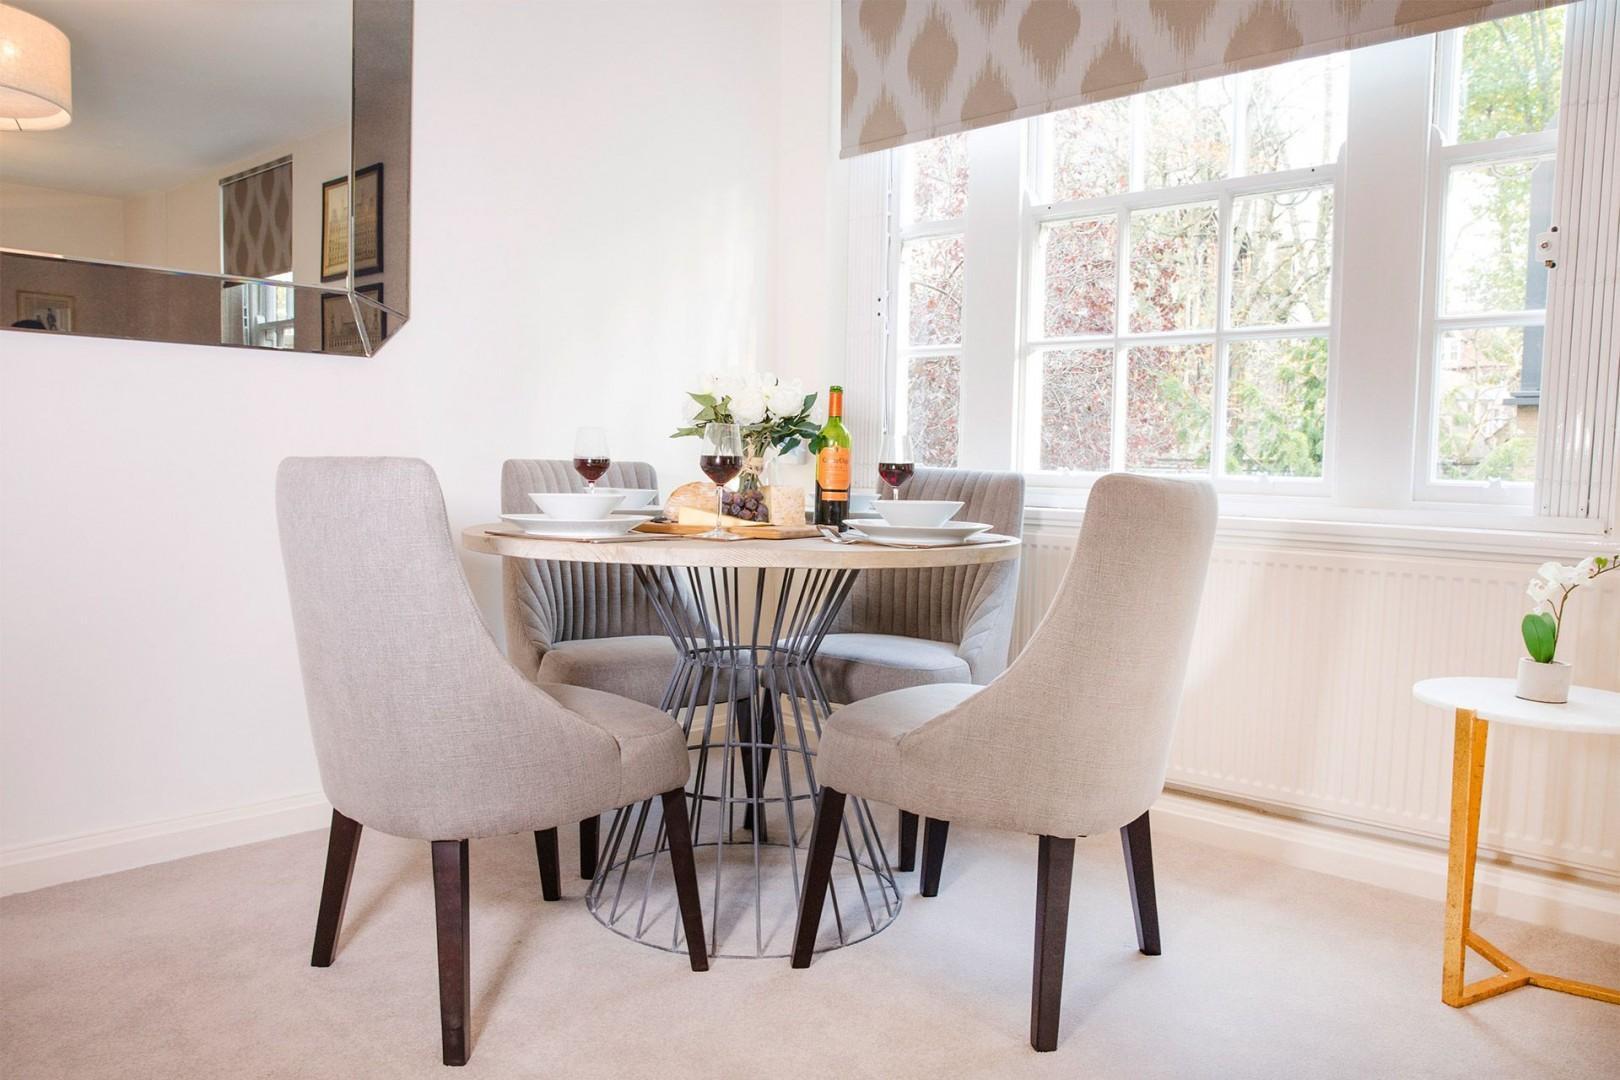 Elegant round dining table